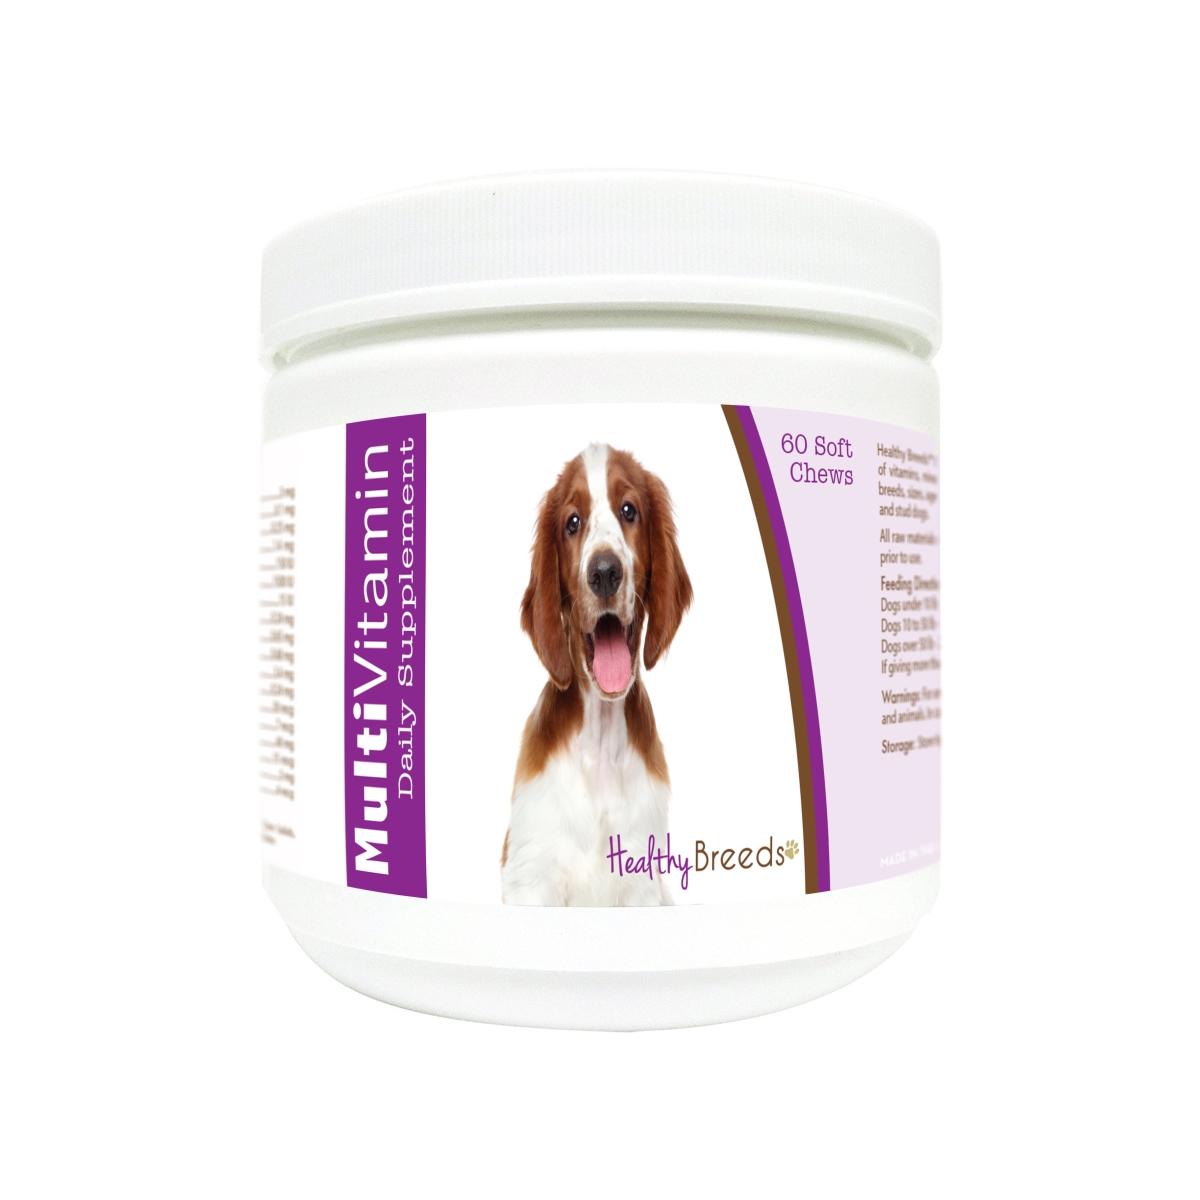 Healthy Breeds 840235177449 Welsh Springer Spaniel Multi-Vitamin Soft Chews - 60 Count